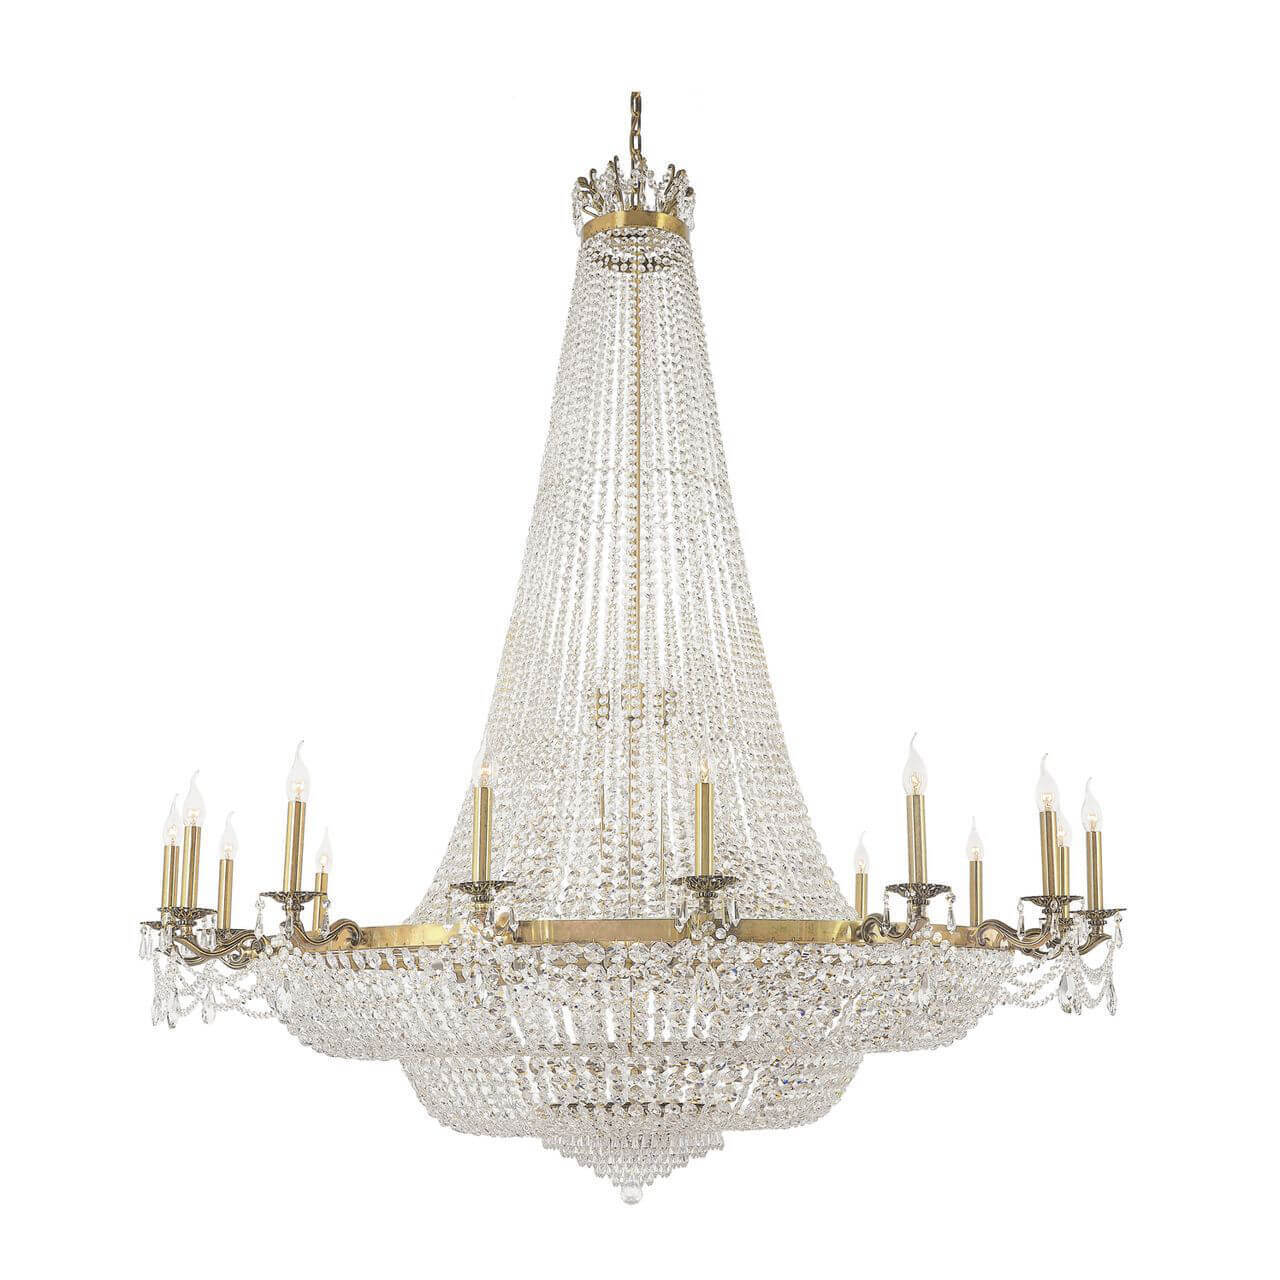 Люстра Dio D`arte Lodi E 1.6.16.200 G Lodi Gold светильник dio d arte lodi e 1 2 80 200 g lodi gold